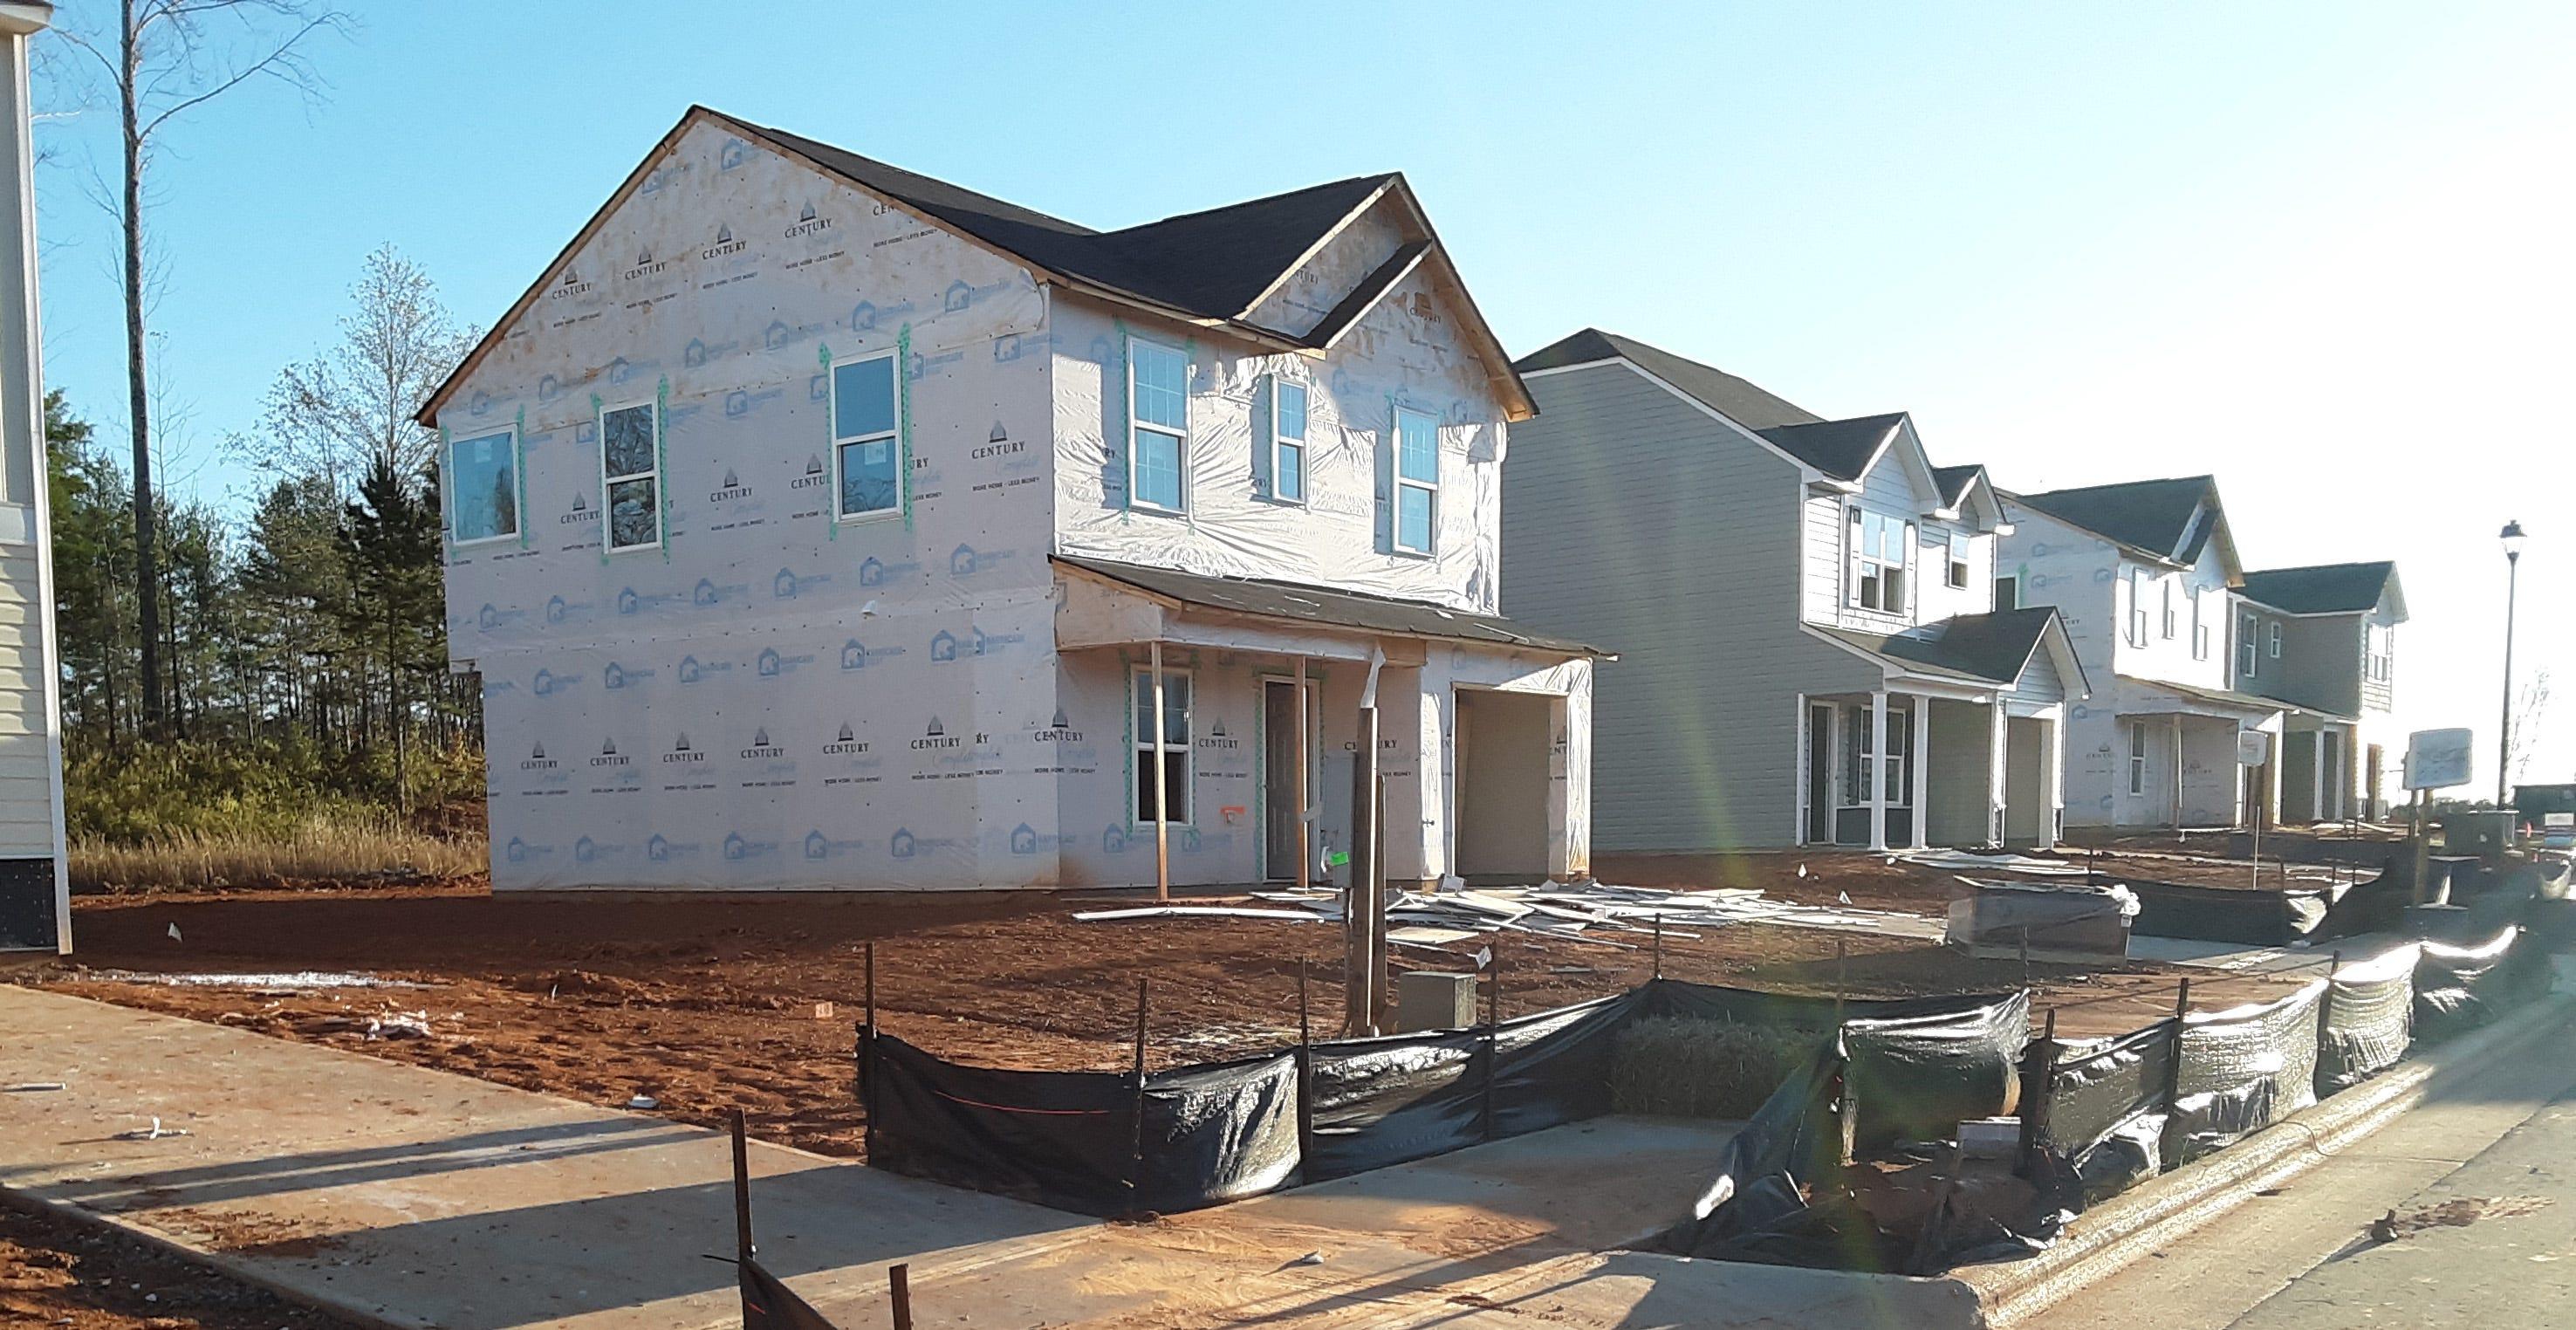 Housing development in Lexington on the rise